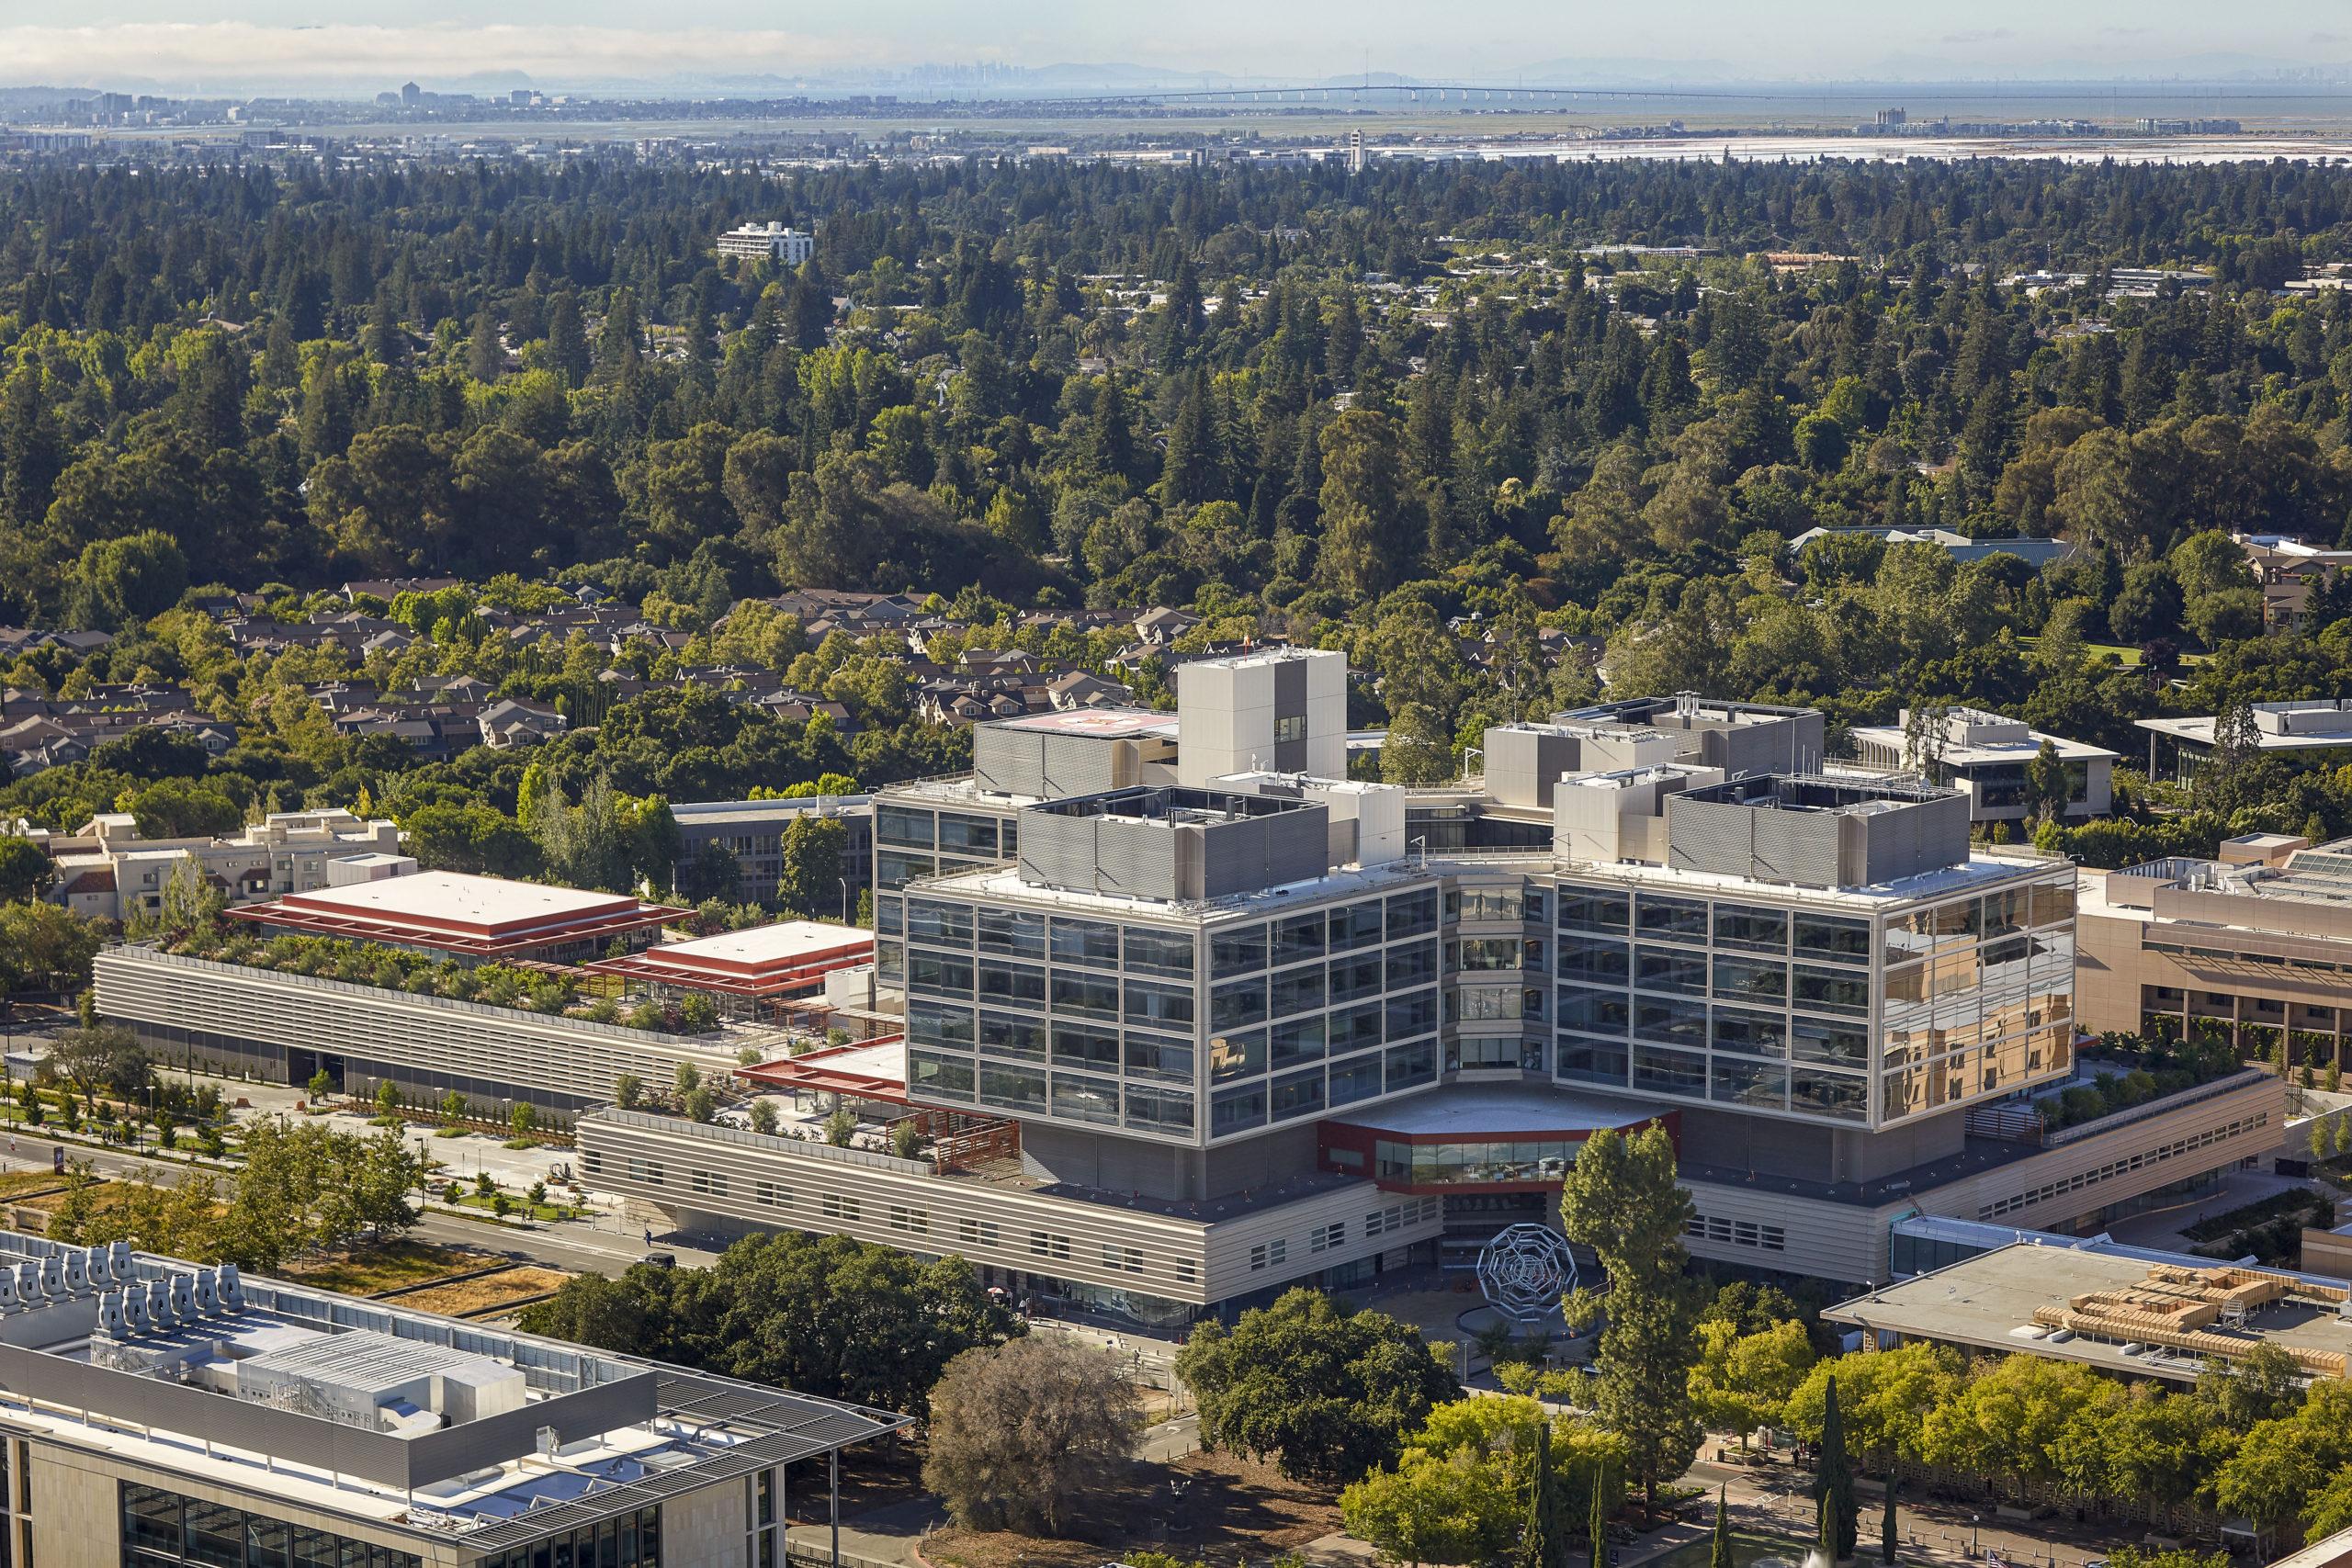 New Stanford Hospital.                                             ©Will Pryce, Courtesy Rafael Viñoly Architects